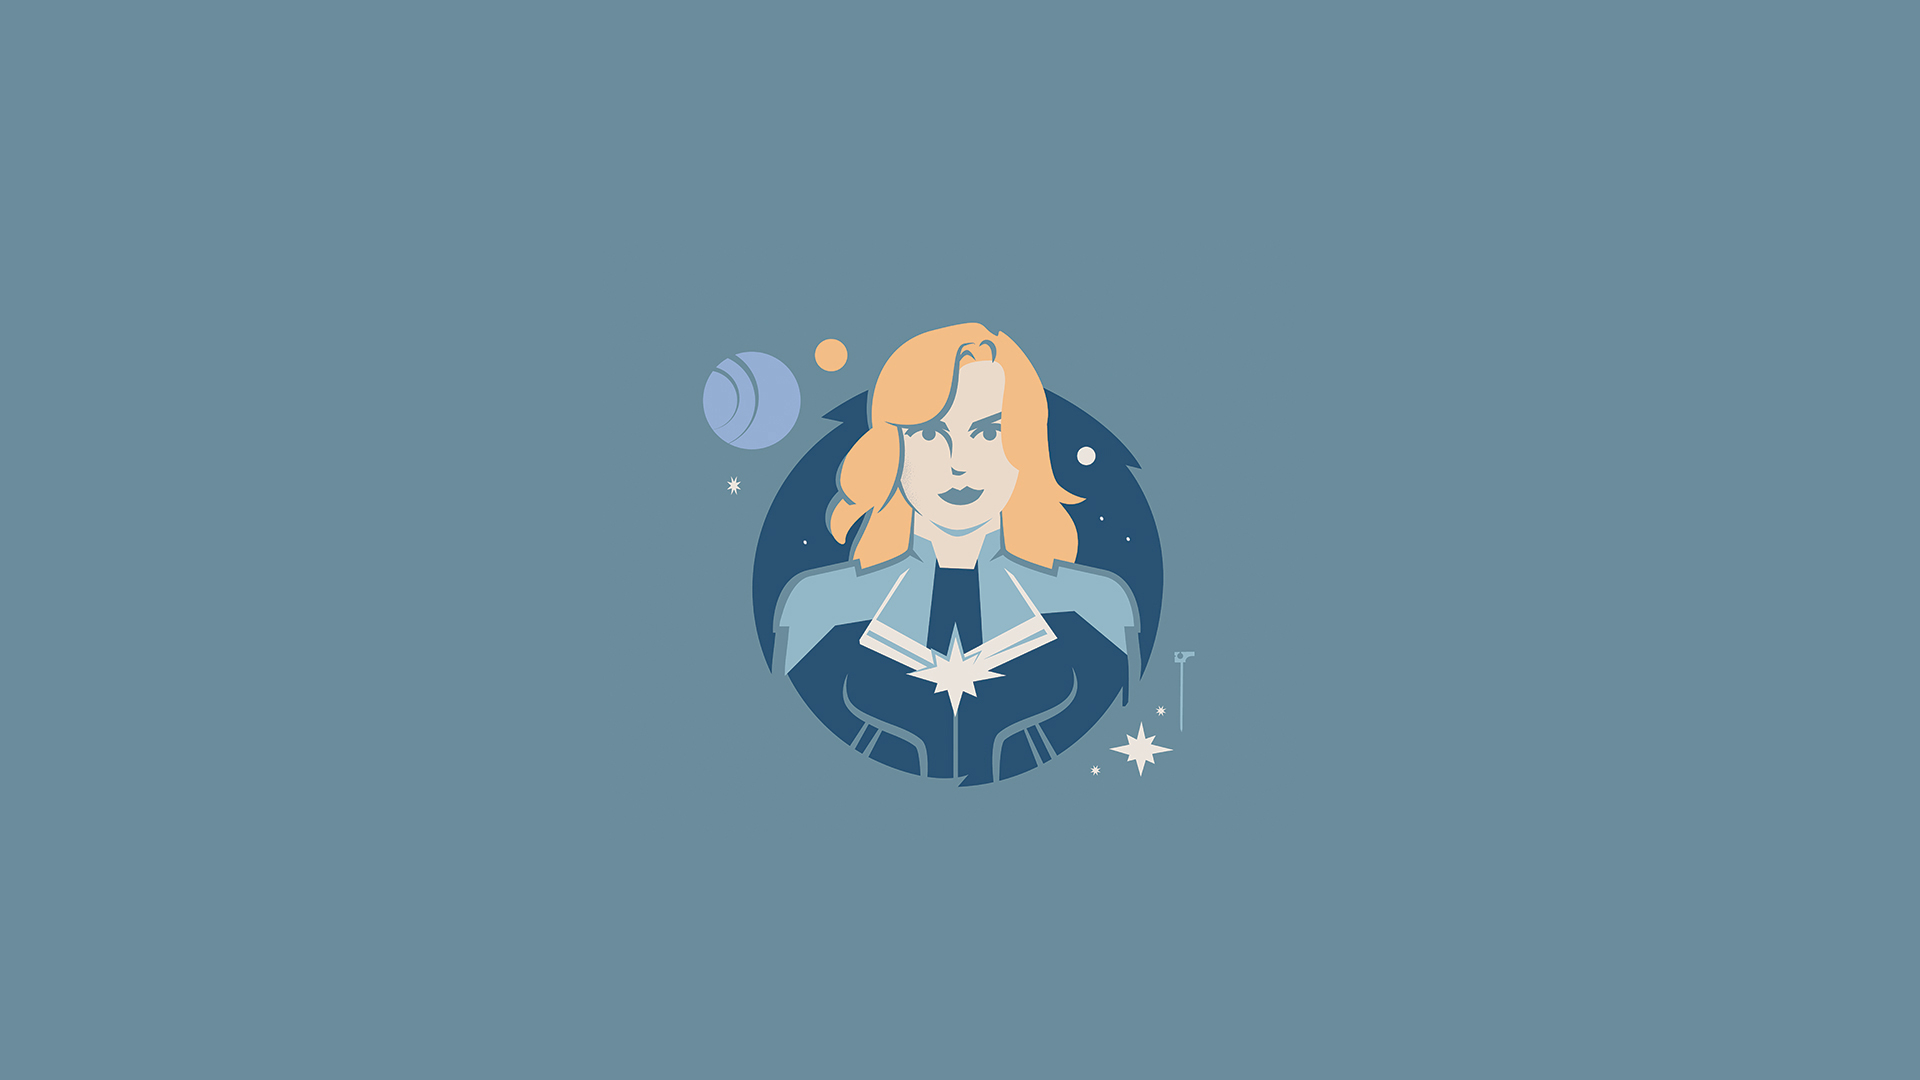 Captain Marvel Minimalist Artwork Wallpaper, HD Minimalist ...